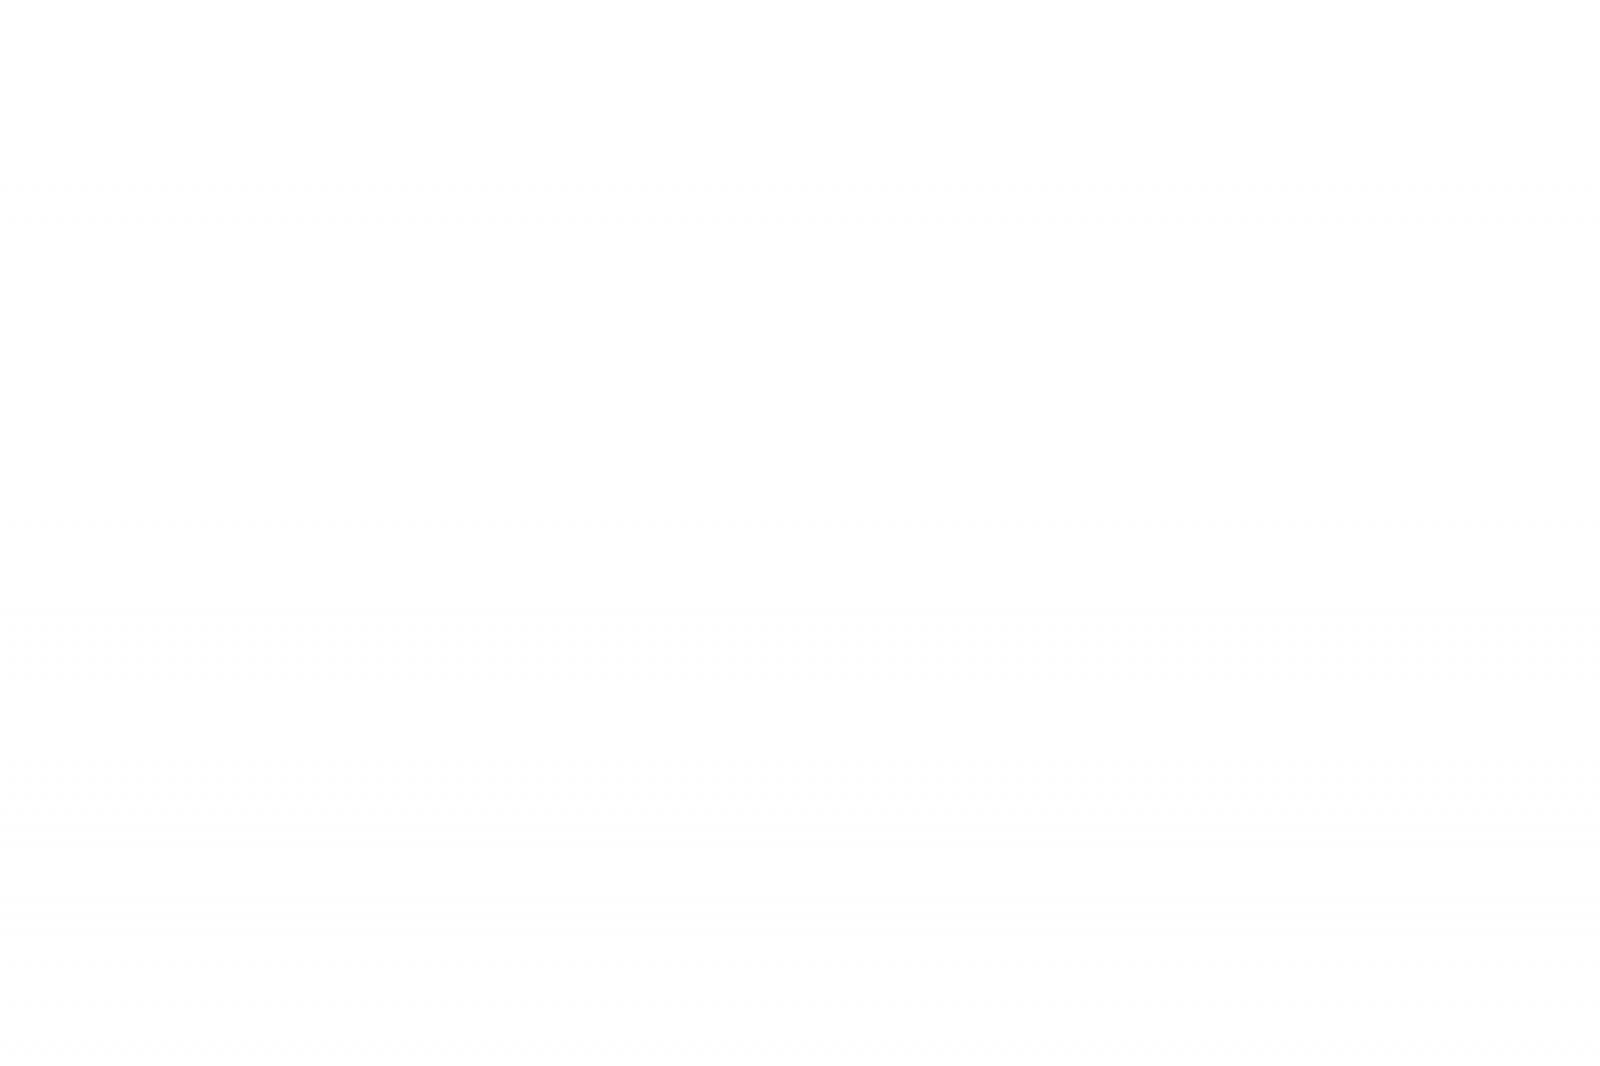 Portrait of a Komodo Dragon